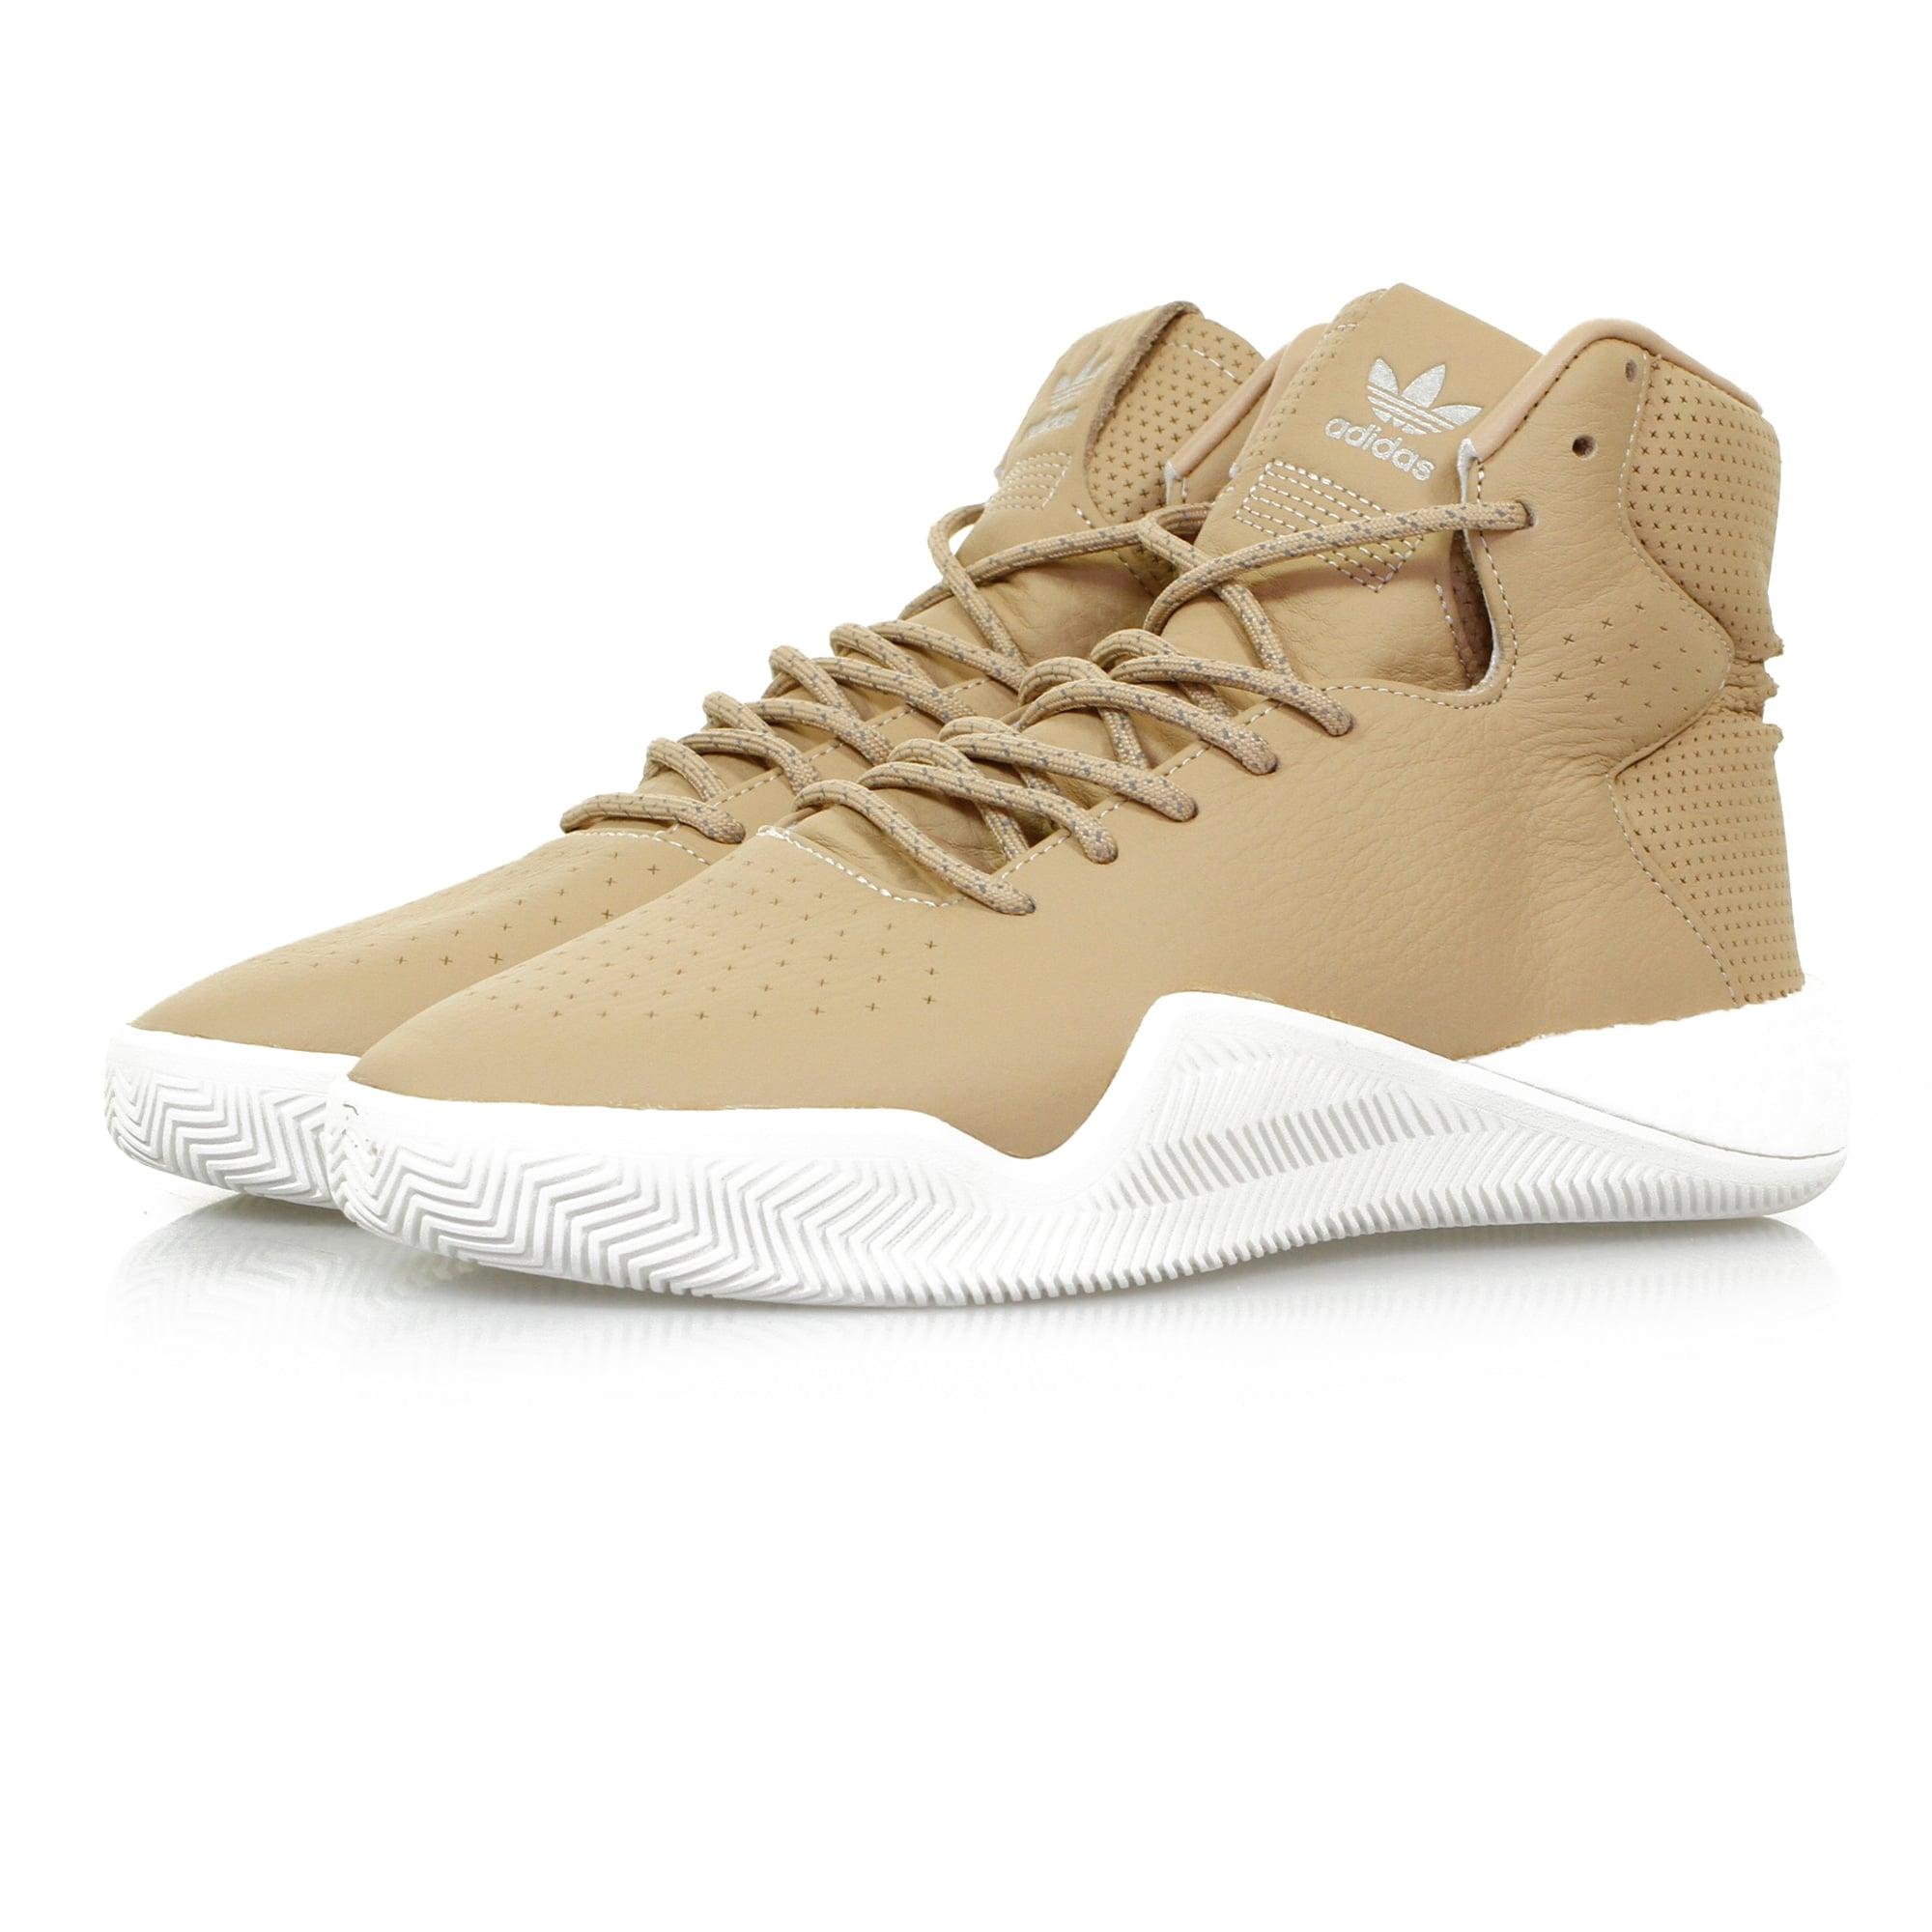 Adidas Tubular Instinct Boost Chalk White Beige Shoe BB8400 38606aed68f6